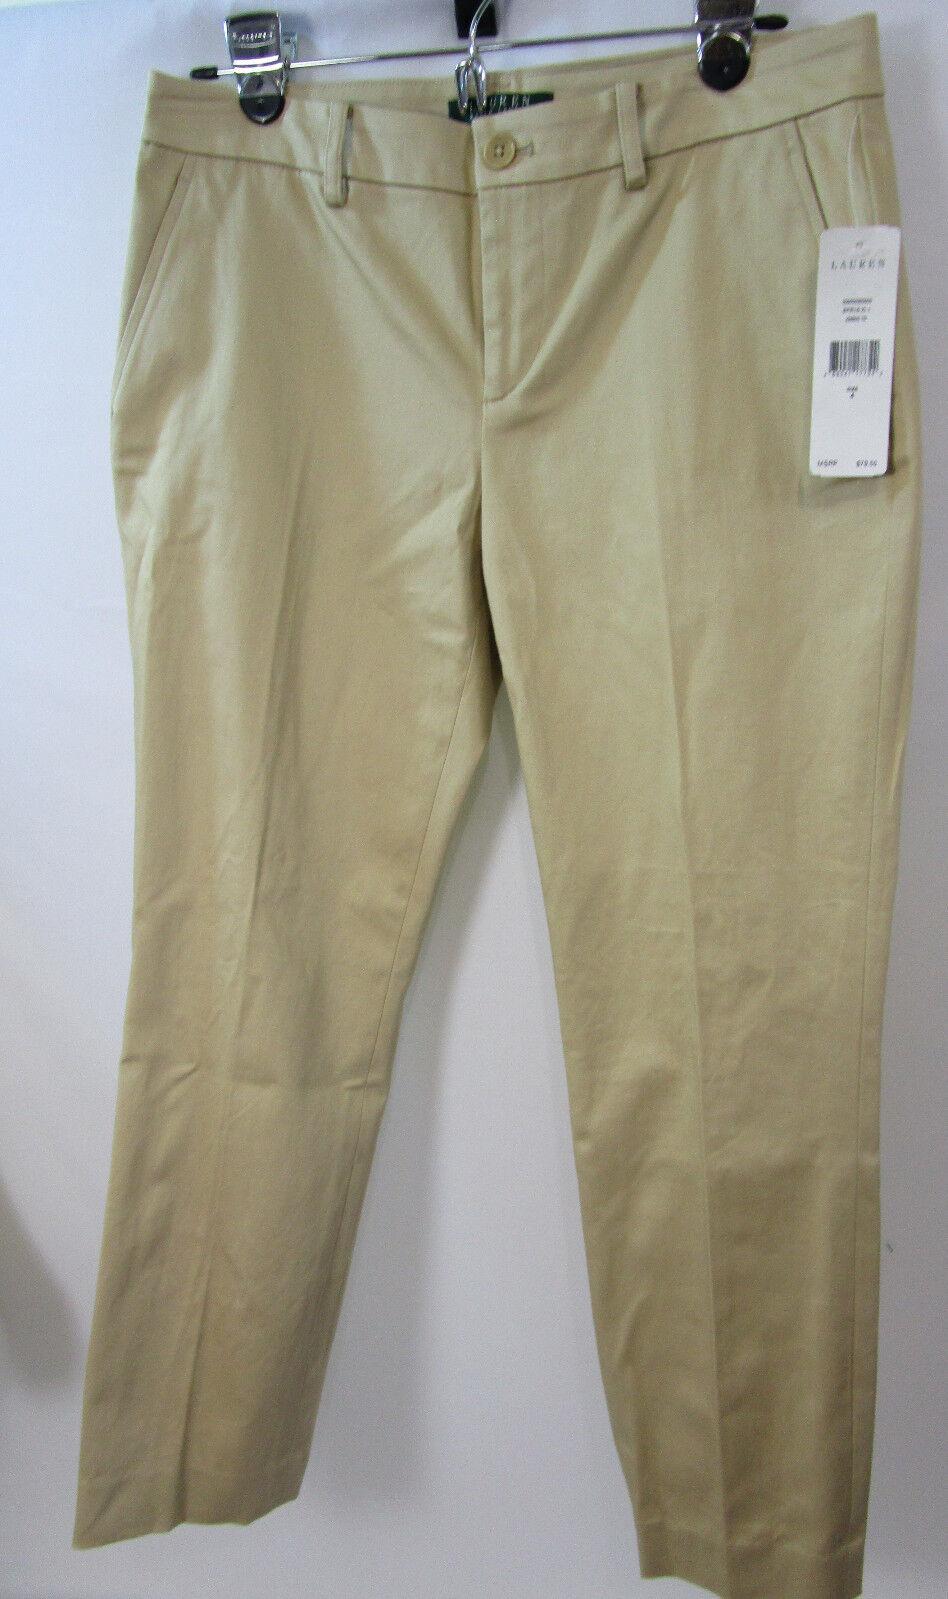 RALPH LAUREN women's KHAKI straight leg CROP pants SIZE 4 new WITH TAG